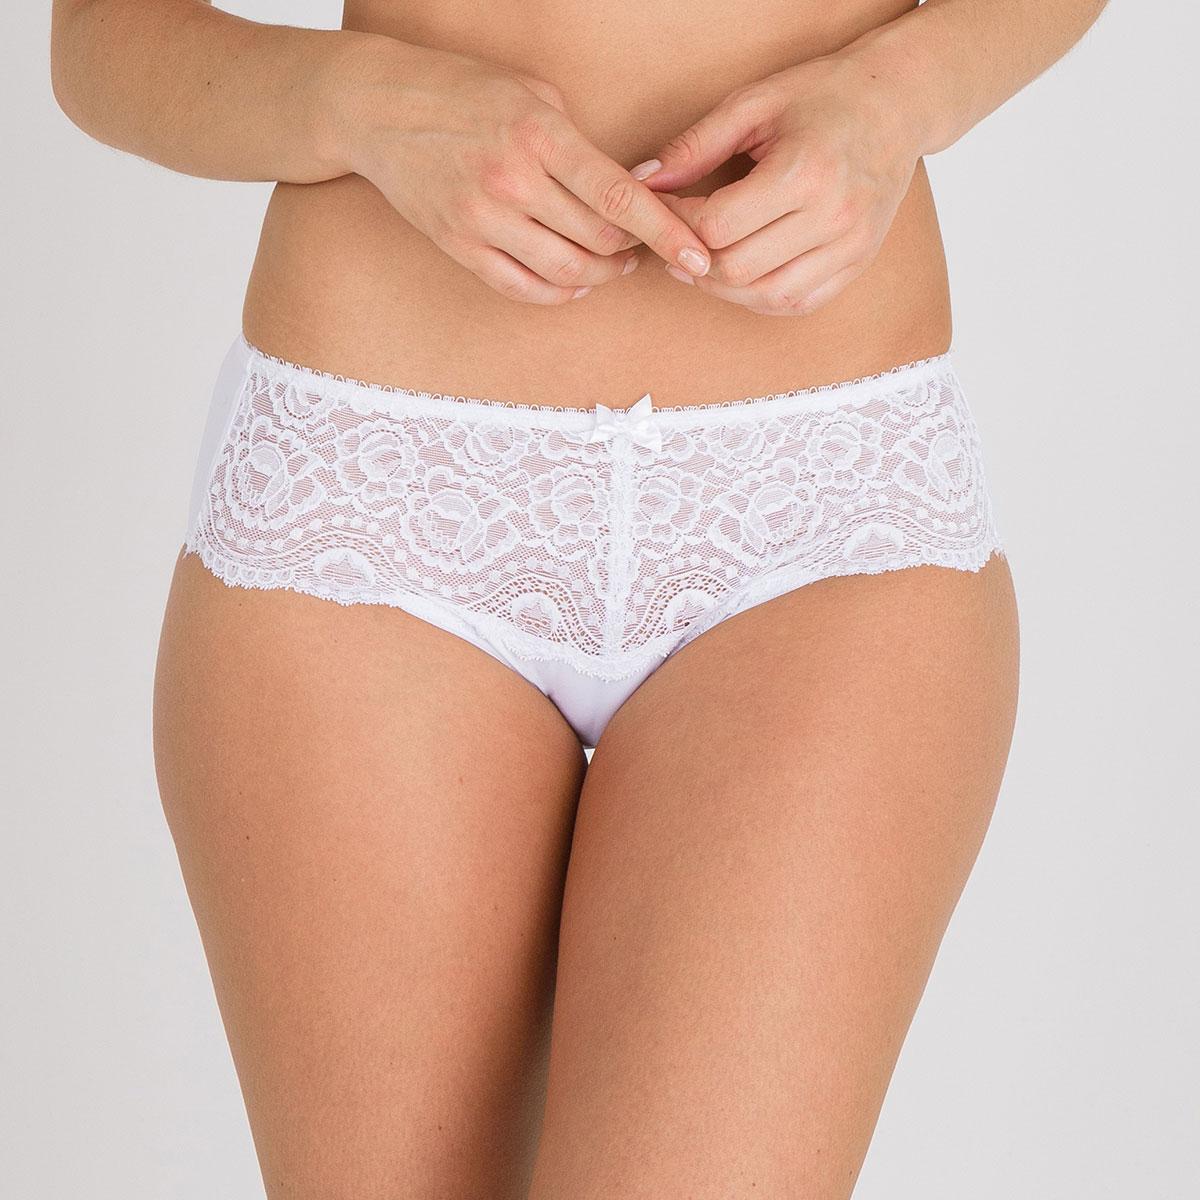 Slip Midi bianco - Flowery Lace, , PLAYTEX